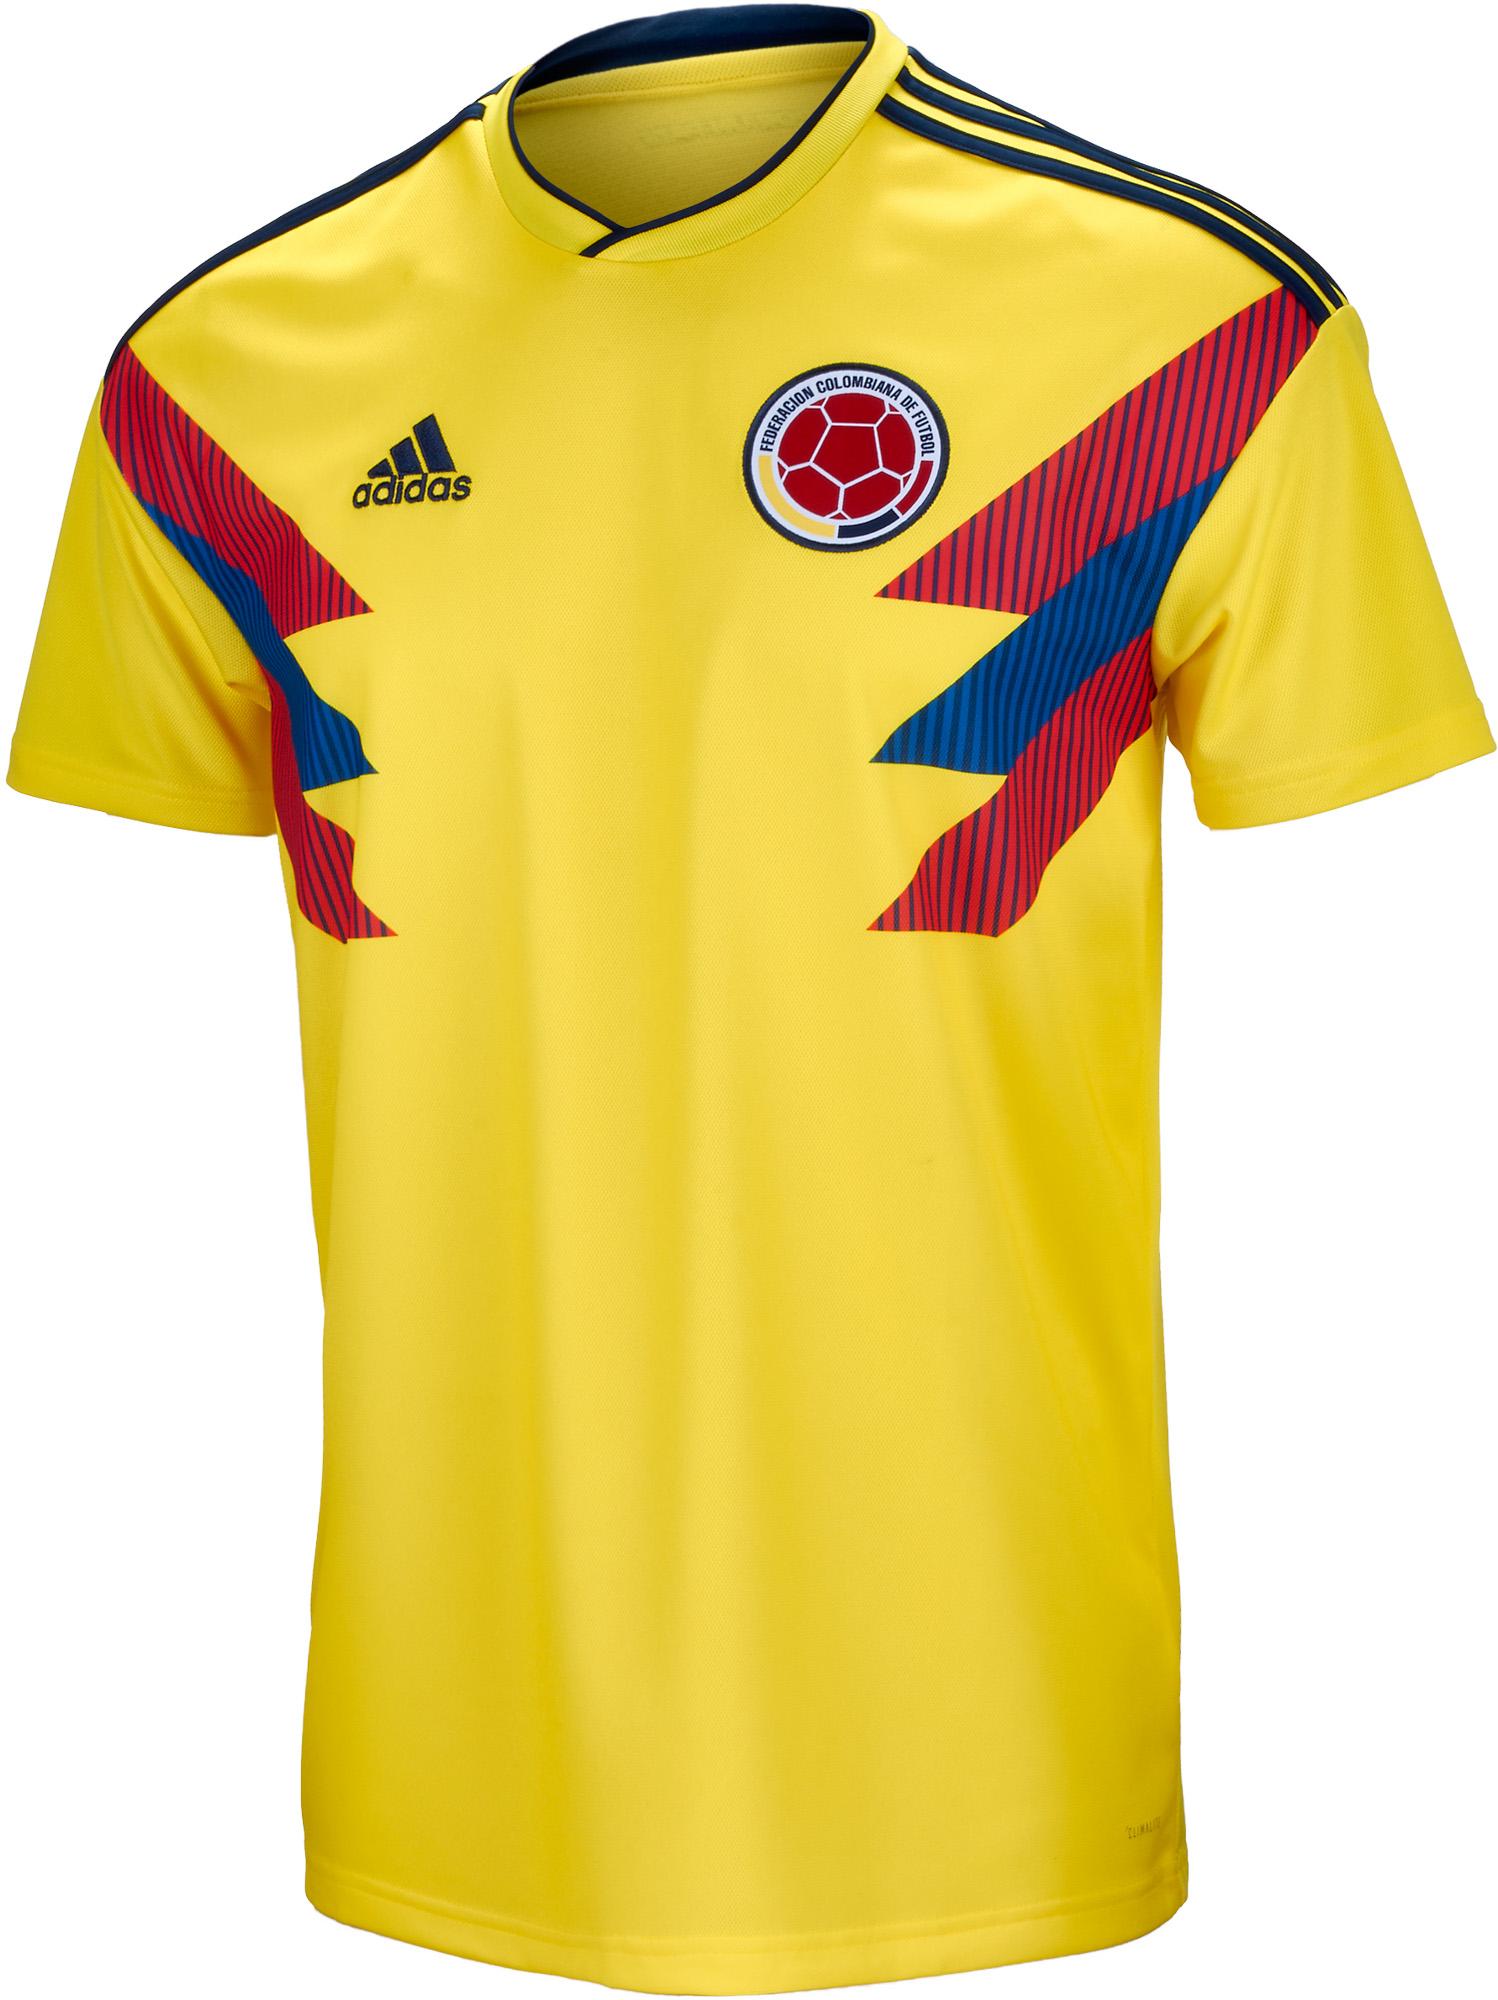 adidas Kids Colombia Home Jersey 2018-19- SoccerPro.com 6eea08033